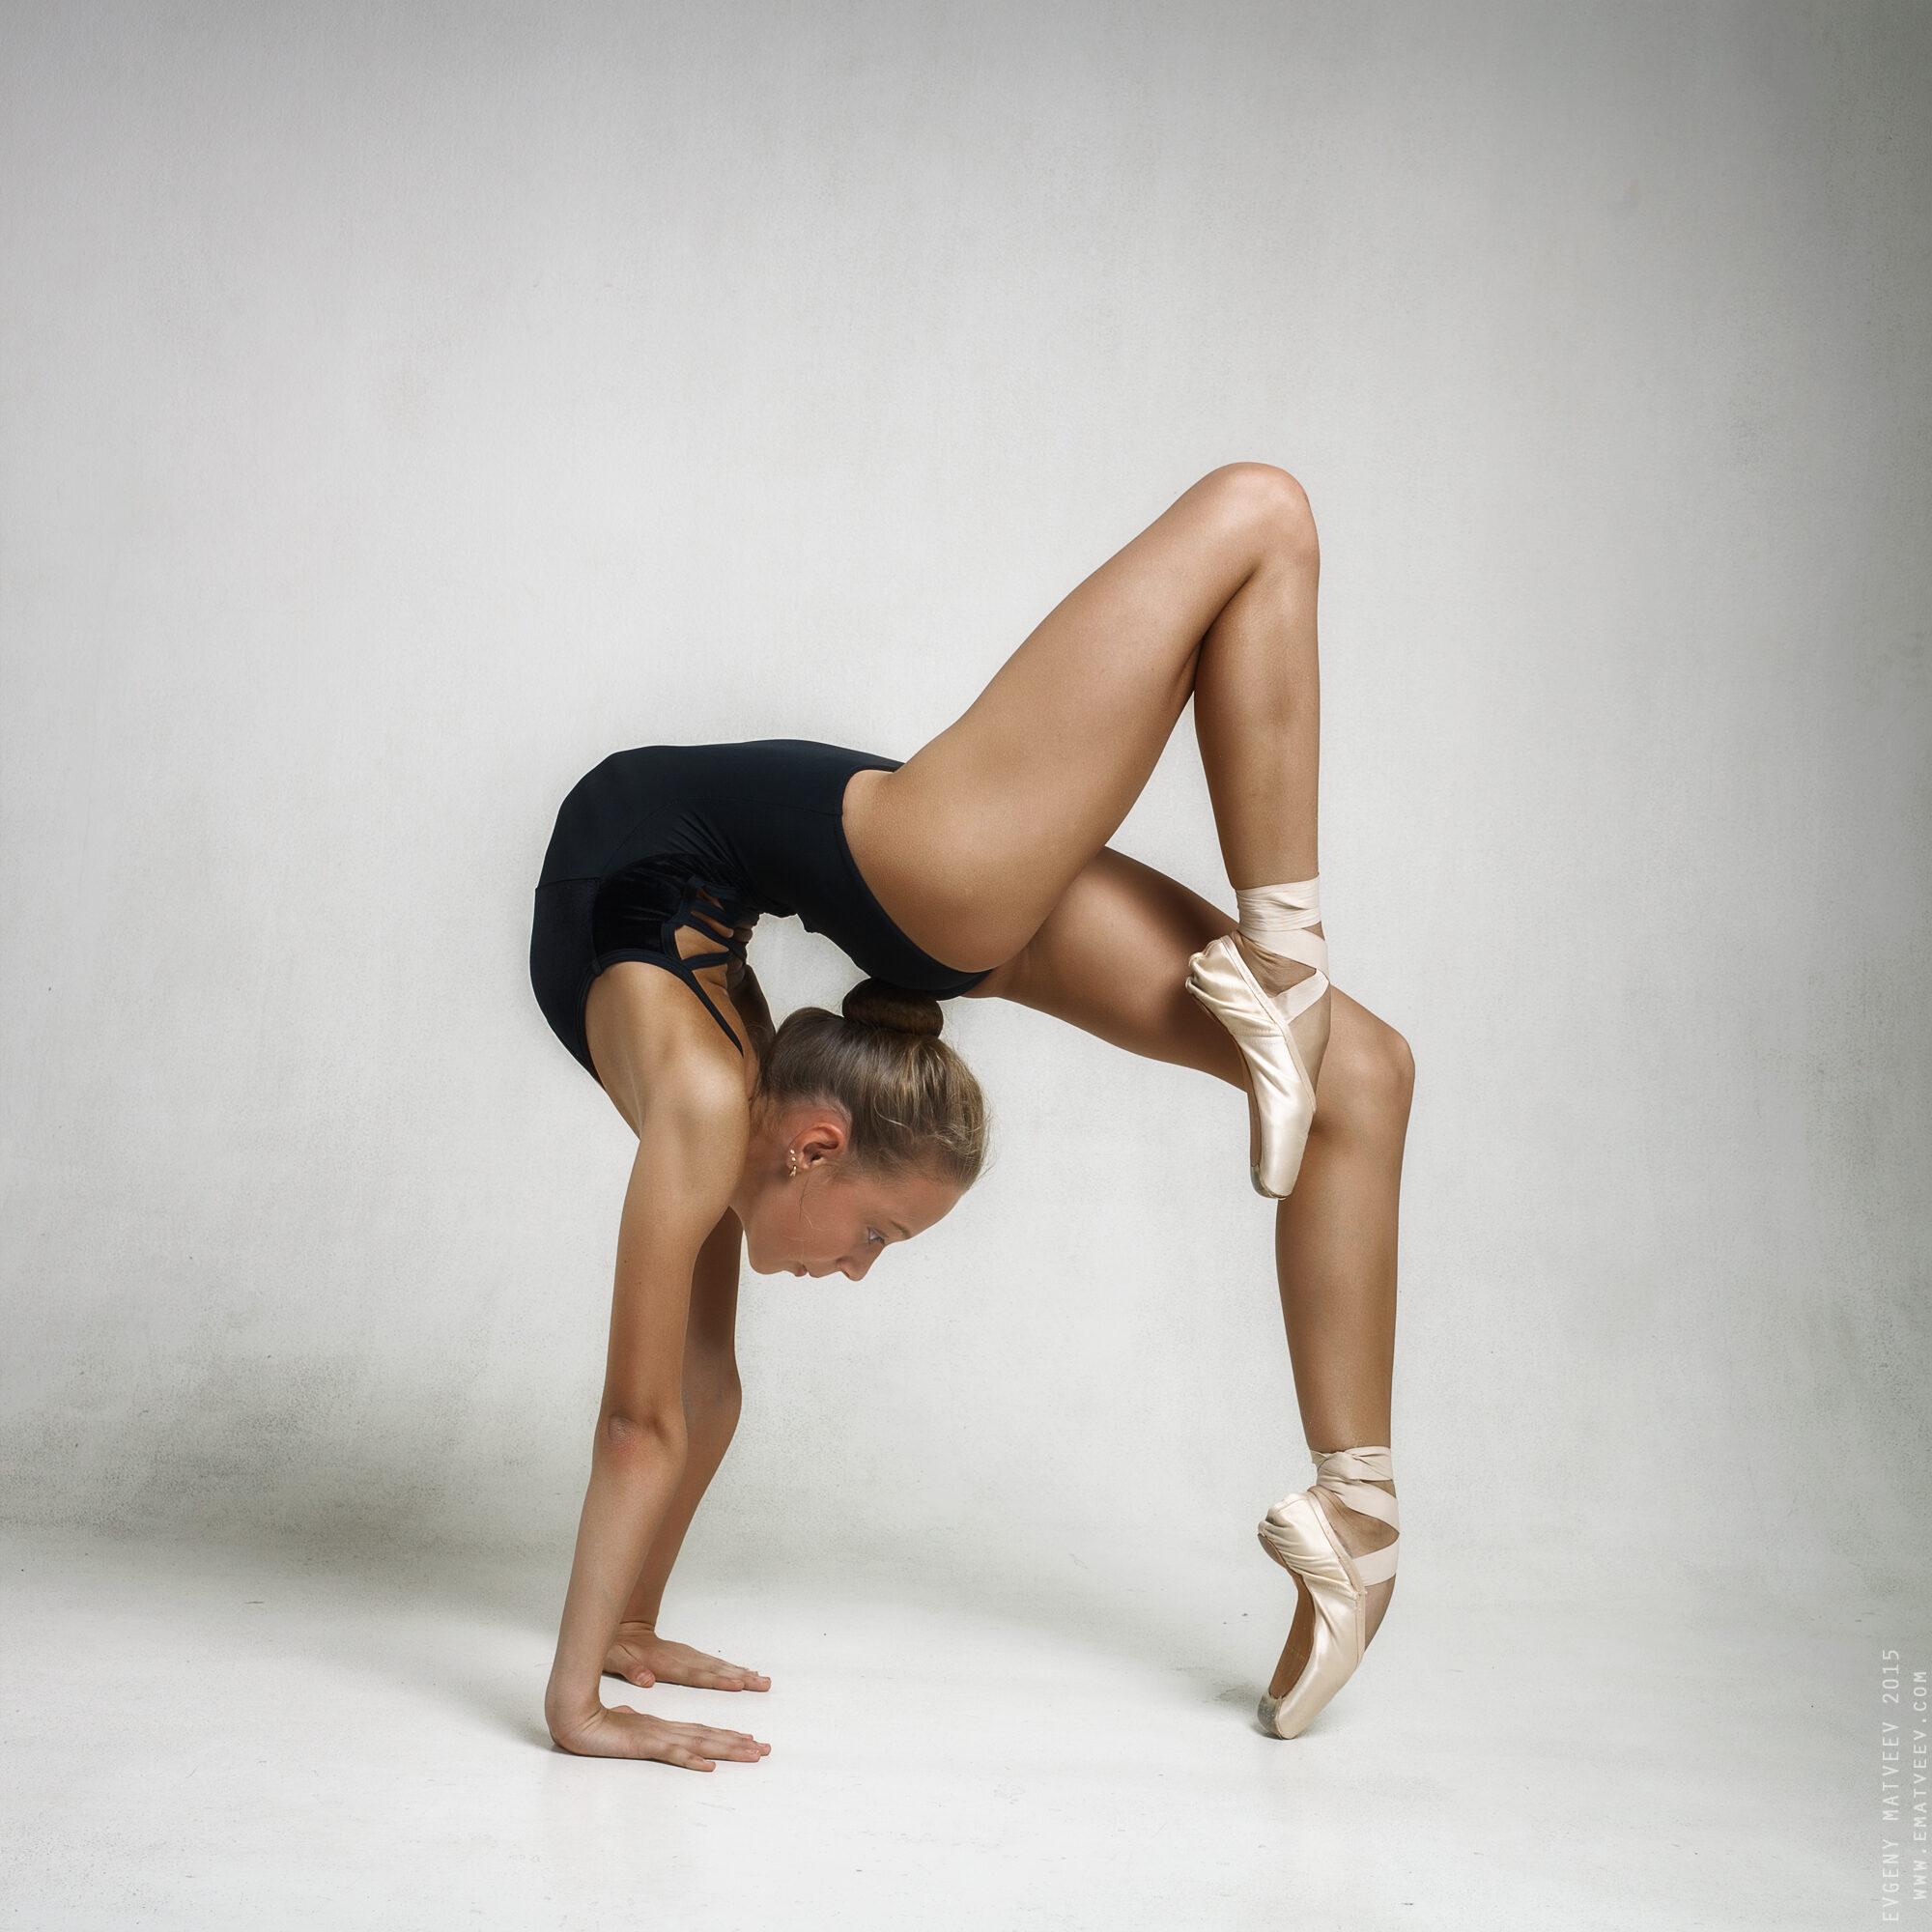 anya_ballet_0006-2000x2000.jpg